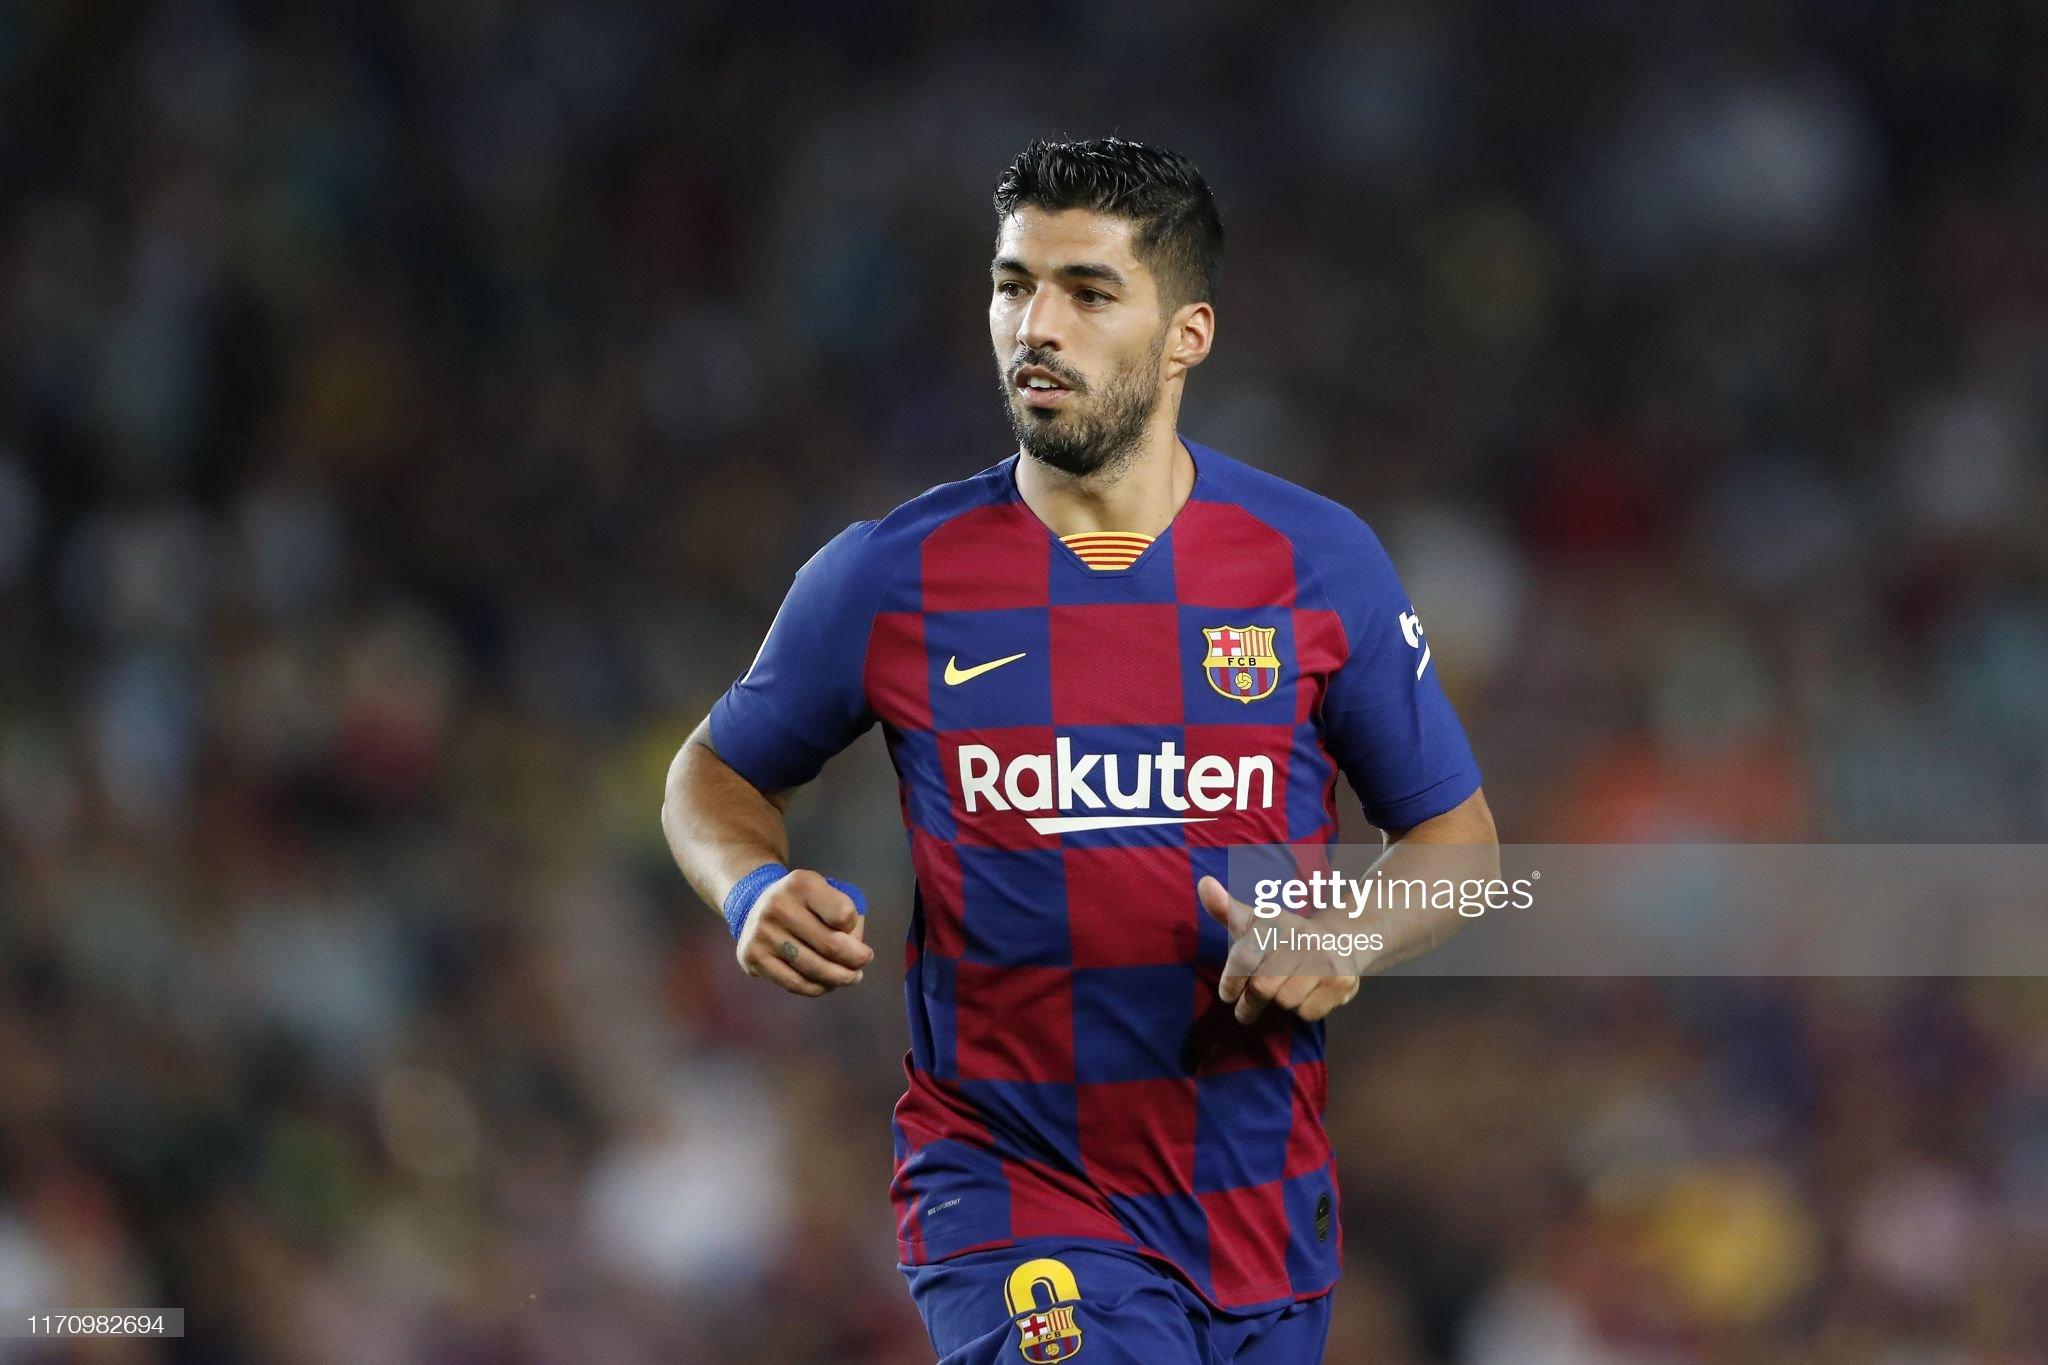 صور مباراة : برشلونة - فياريال 2-1 ( 24-09-2019 )  Luis-suarez-of-fc-barcelona-during-the-laliga-santander-match-between-picture-id1170982694?s=2048x2048